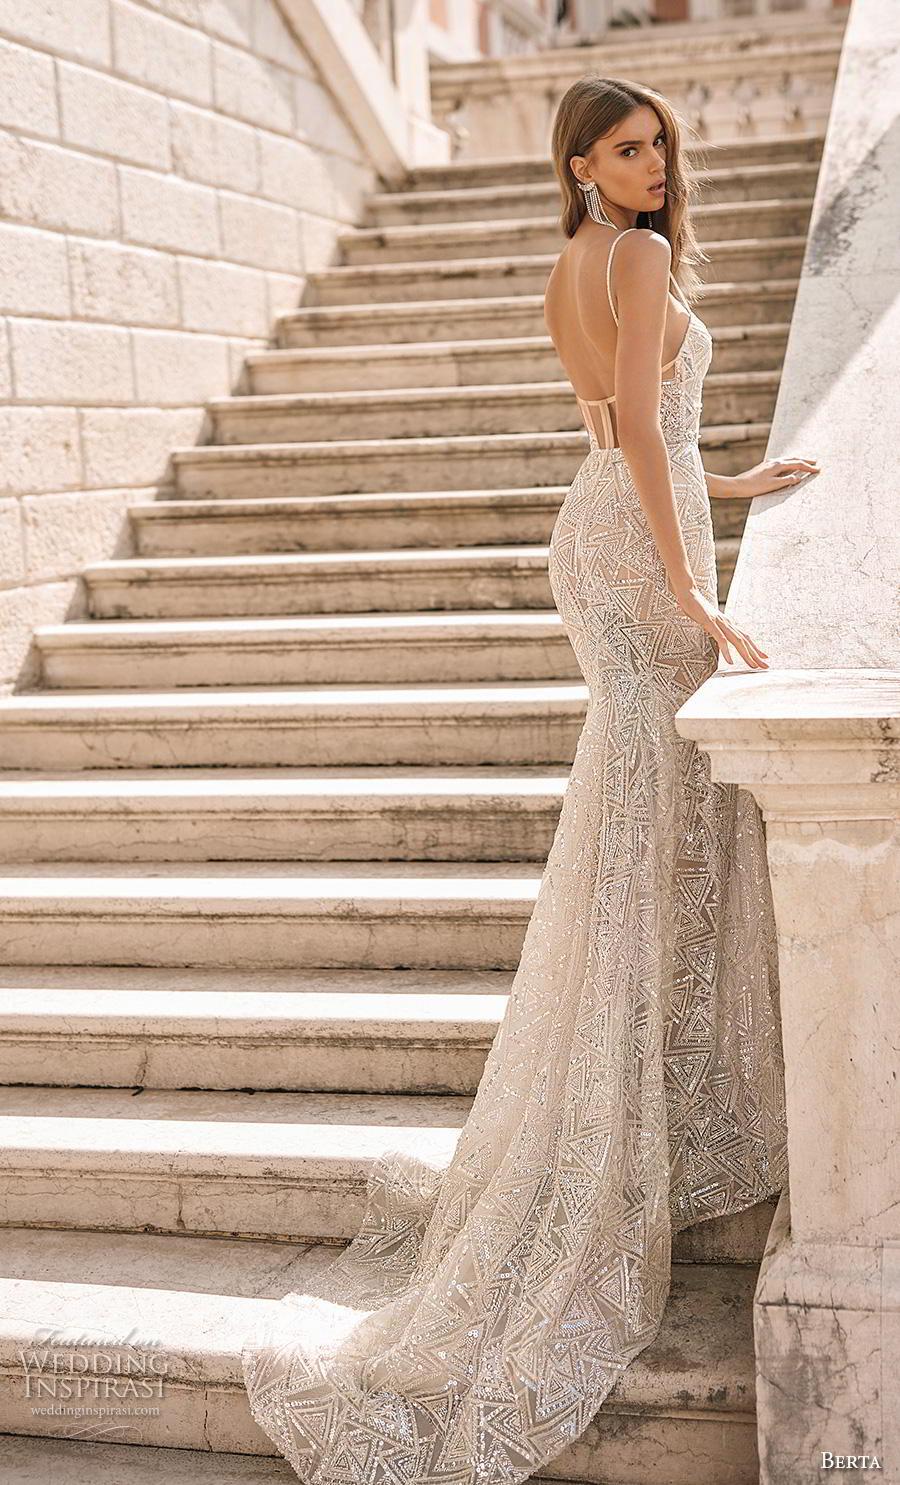 berta 2019 privee bridal thin strap sweetheart neckline full embellishment bustier glitzy glamorous elegant sheath wedding dress backless chapel train (8) bv